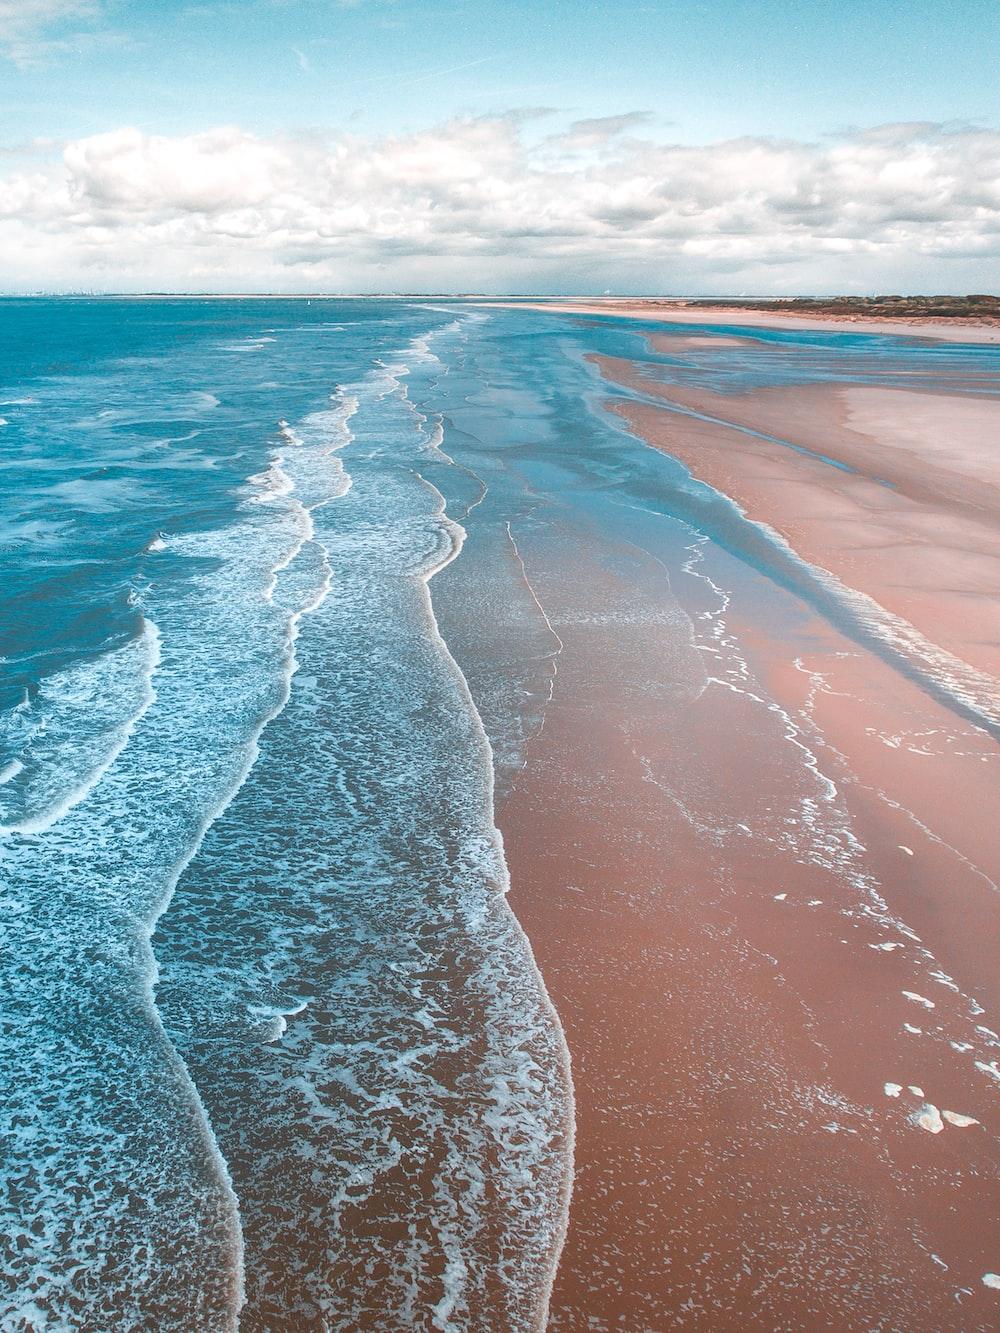 Beach Wallpapers Free Hd Download 500 Hq Unsplash